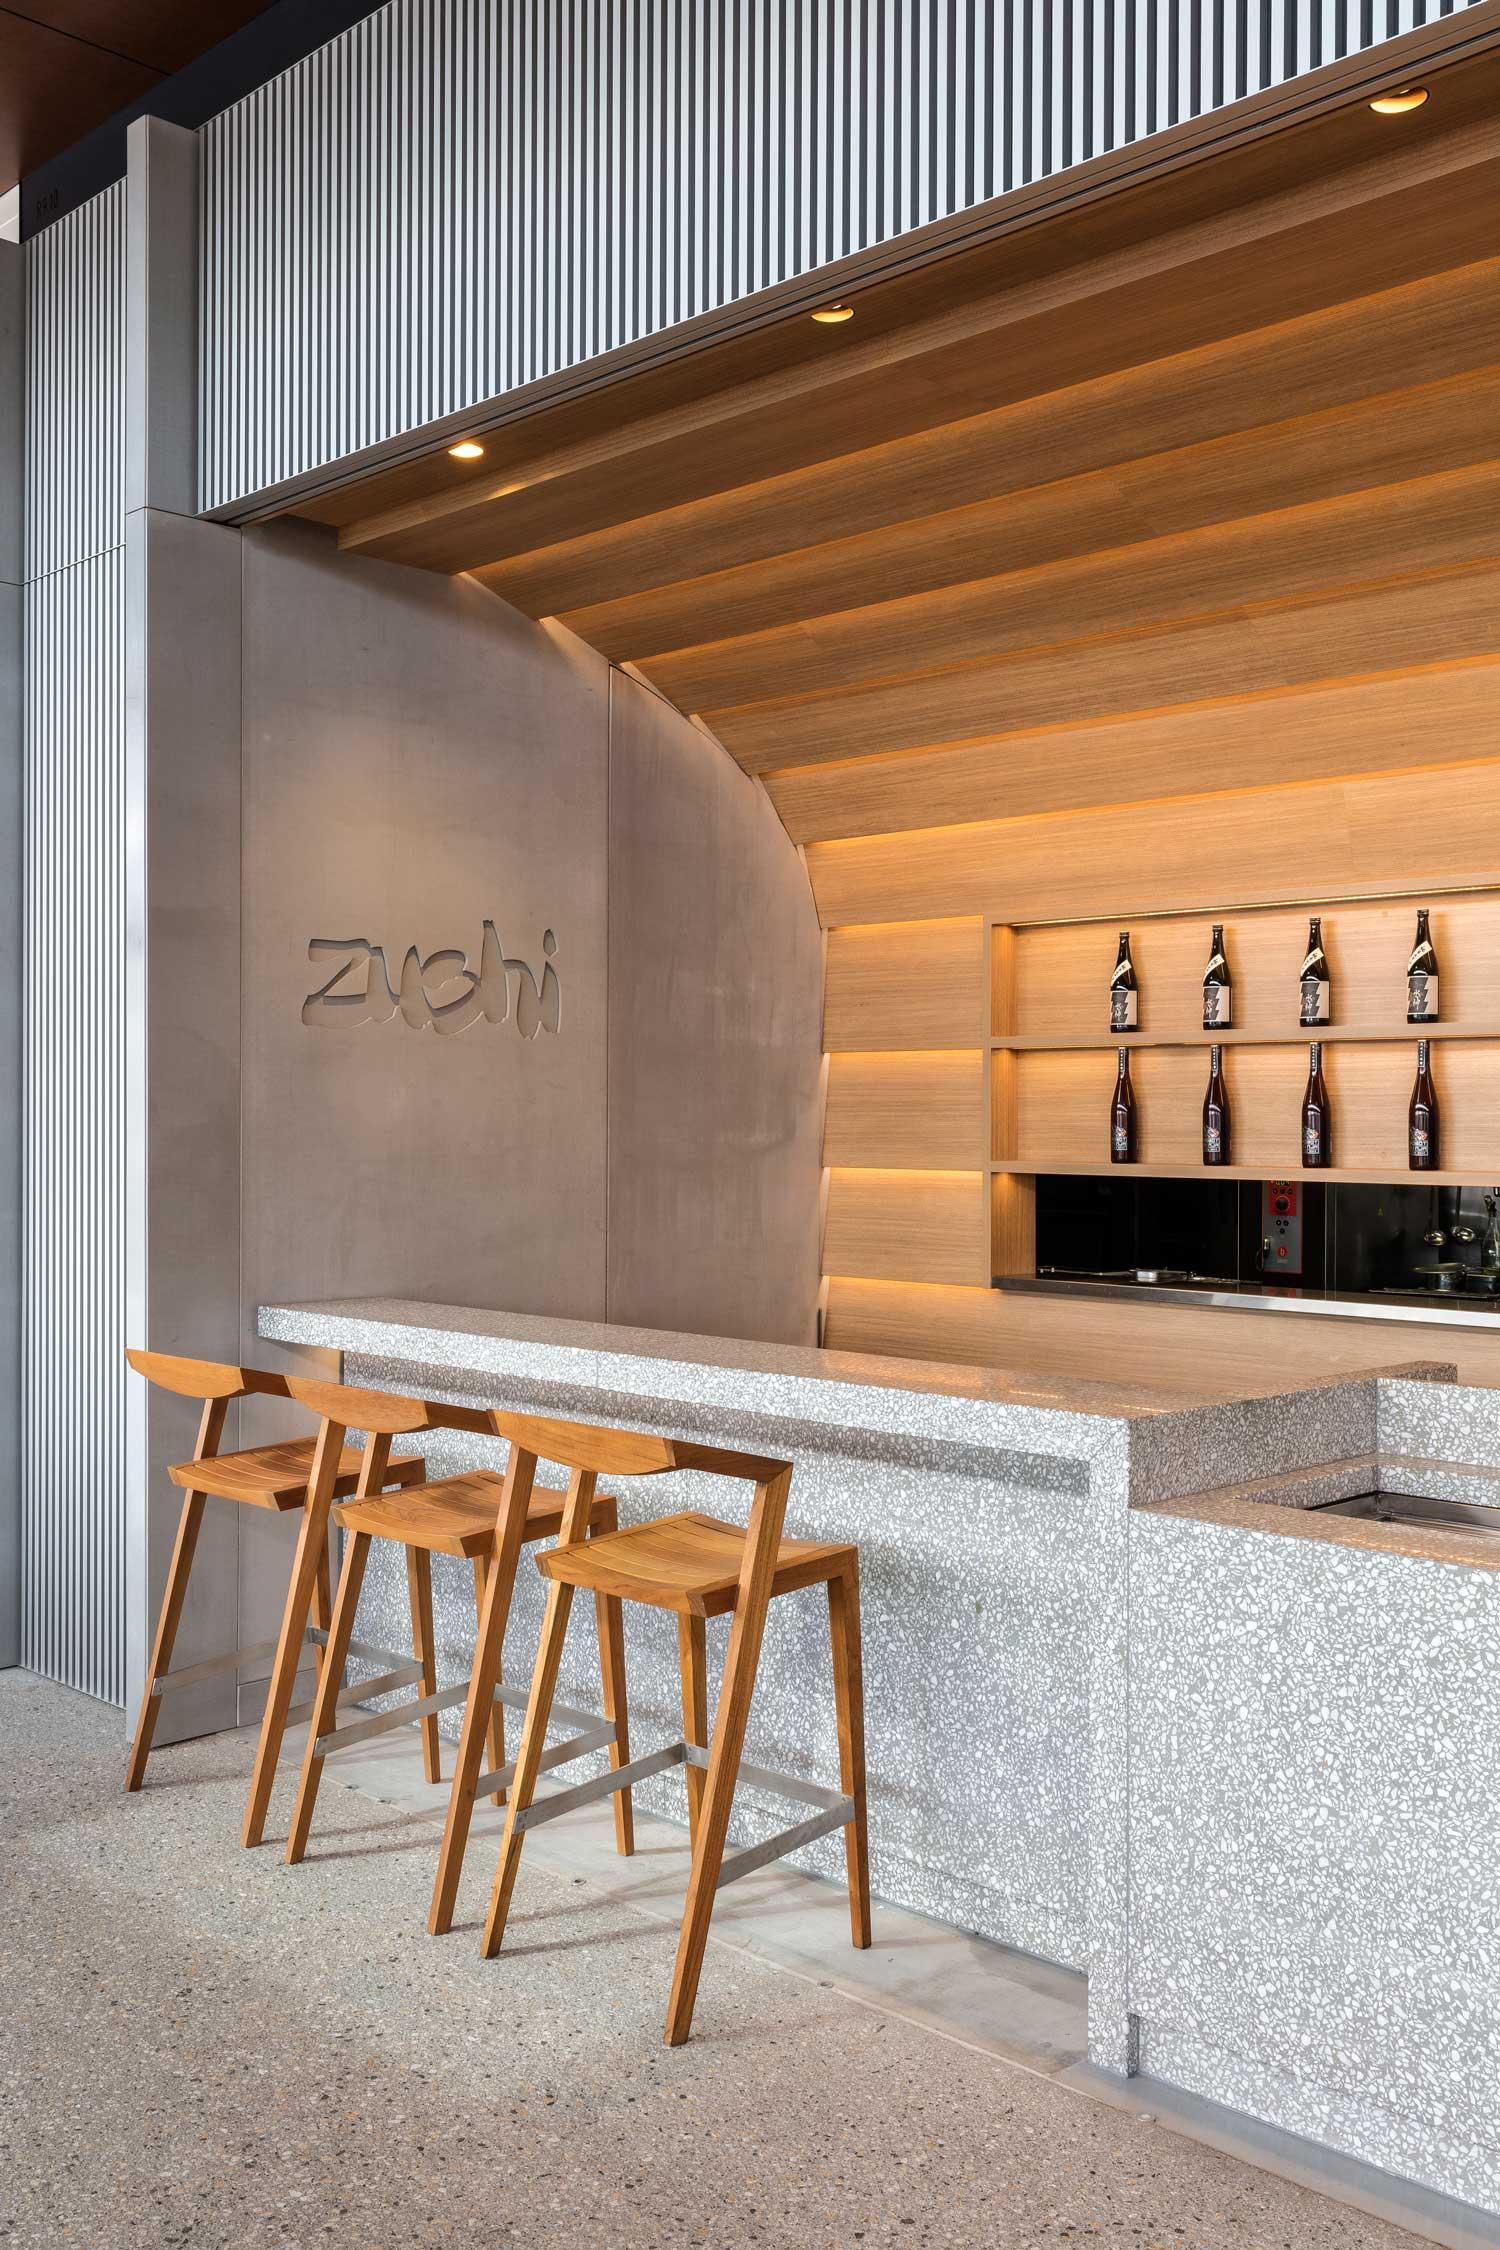 Zushi barangaroo by koichi takada architects yellowtrace for Exterior restaurant design ideas